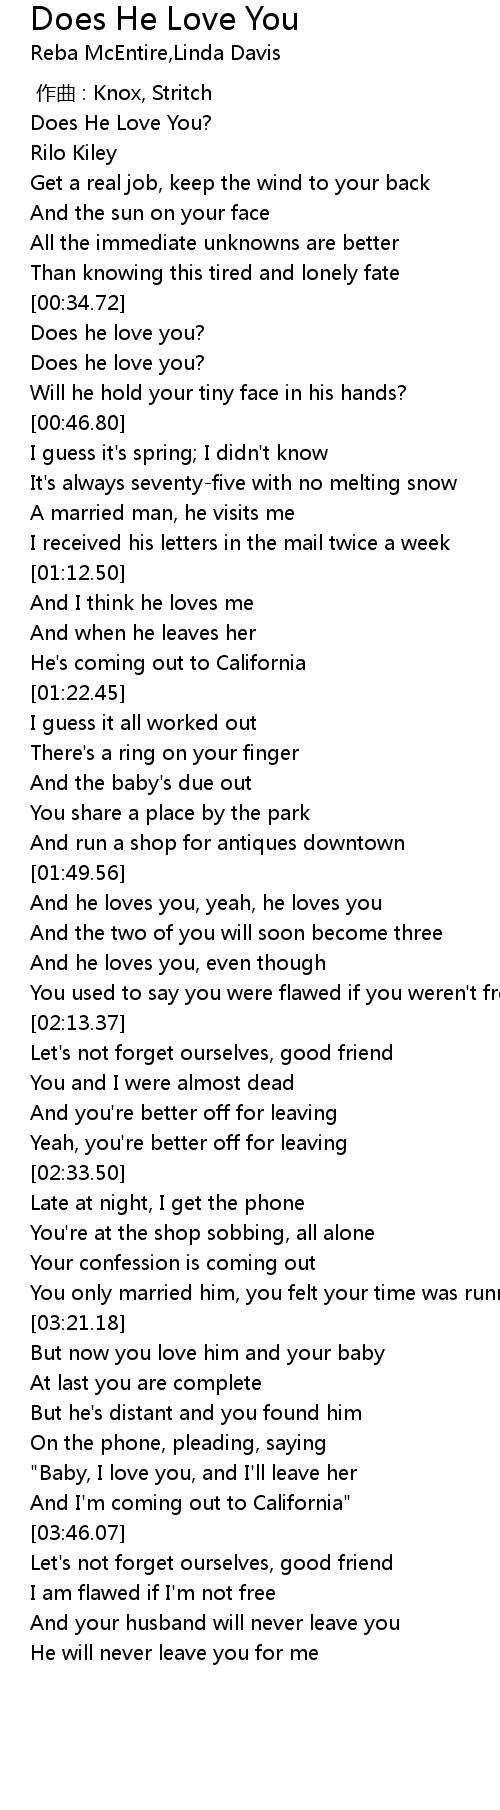 Does He Love You Lyrics - Follow Lyrics